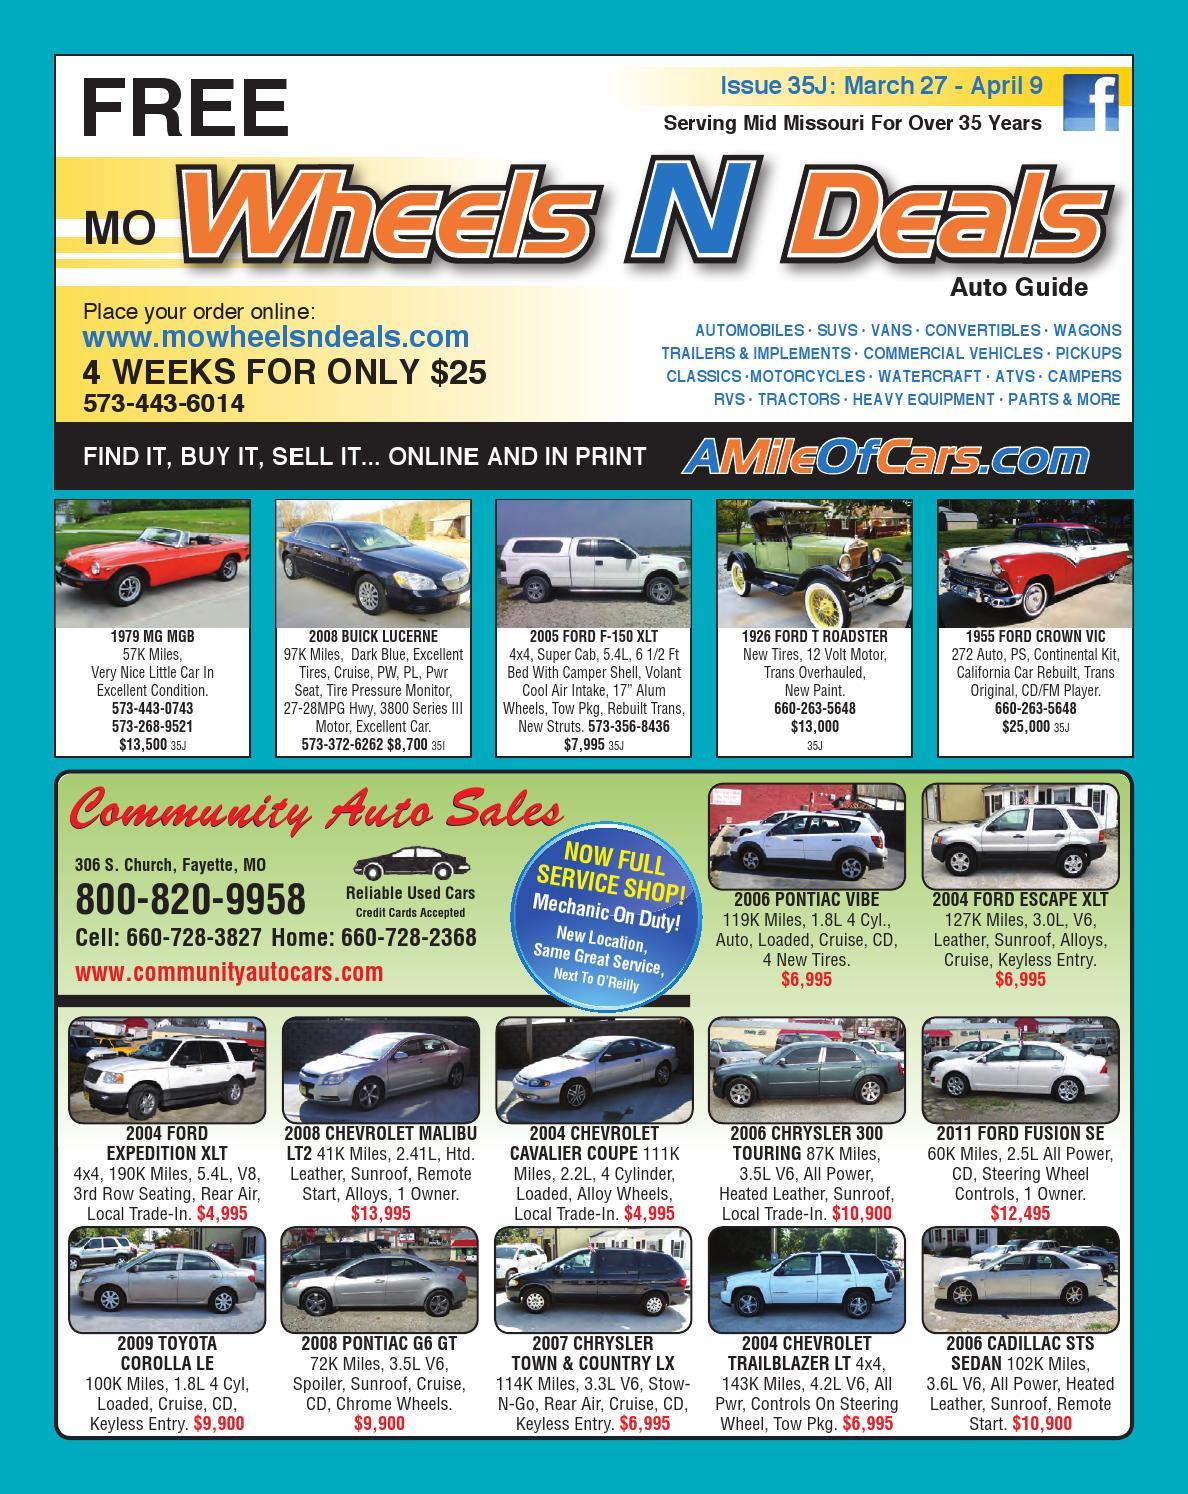 Wheels N Deals Issue 35j By Maximum Media Inc Issuu Basic Remote Start Walkthrough On Your Nissan Infiniti Vehicle